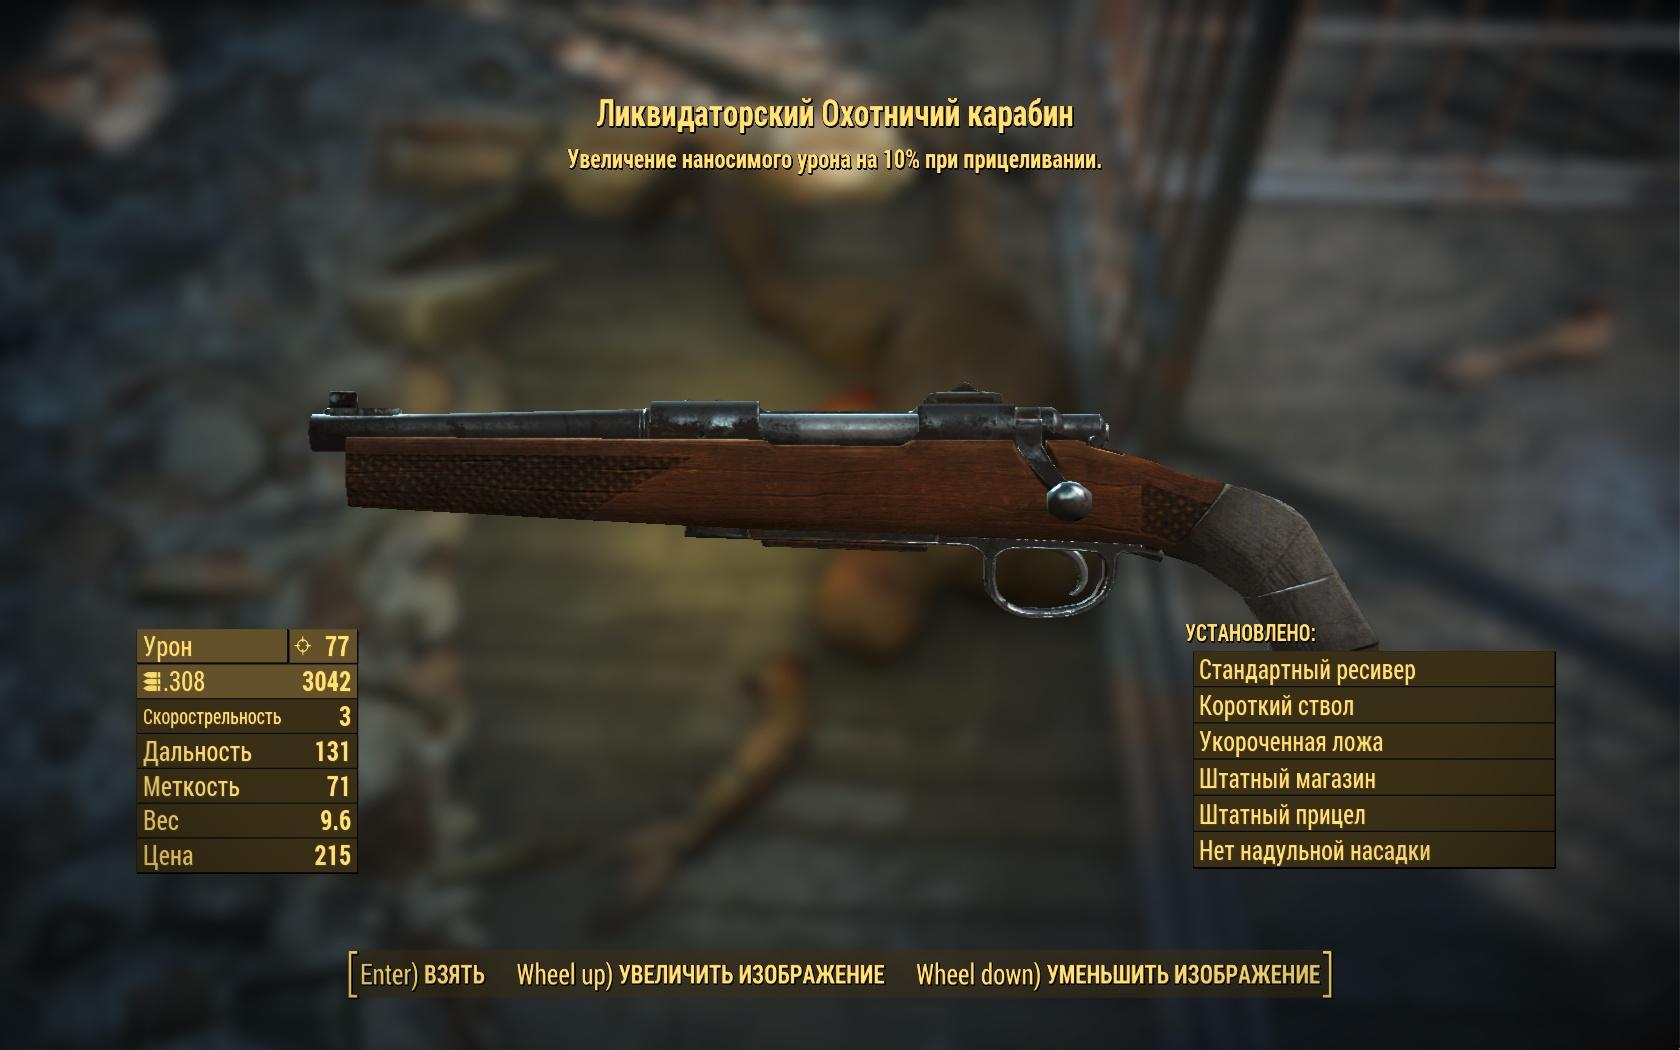 карабин - Fallout 4 Ликвидаторский, Оружие, охотничий